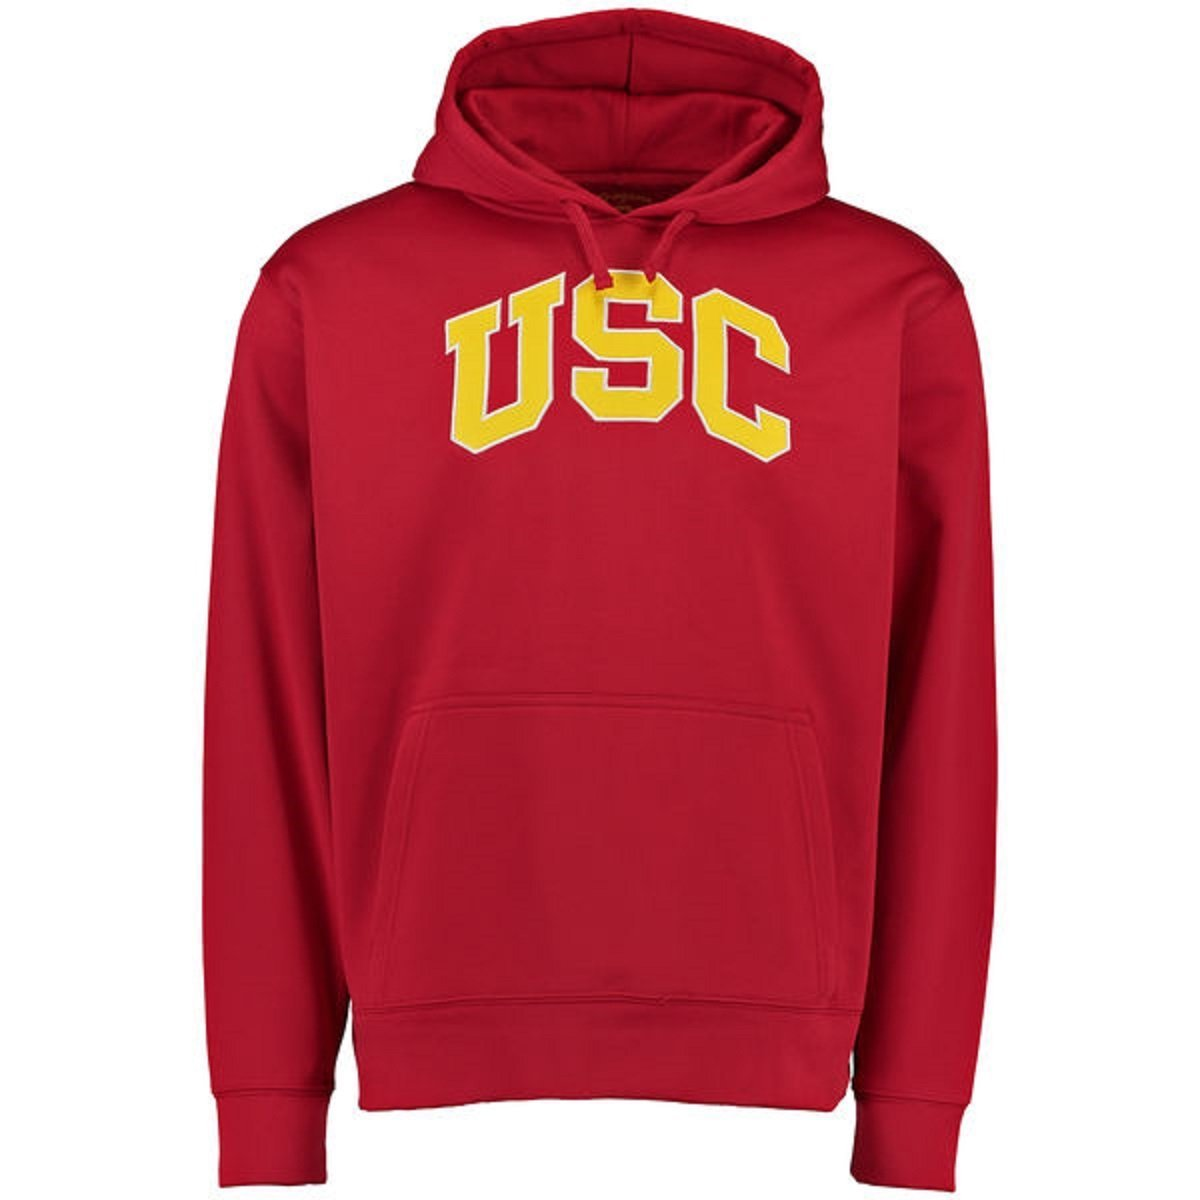 USC Trojans Red Arched Wordmark Hooded Sweatshirt Hoody